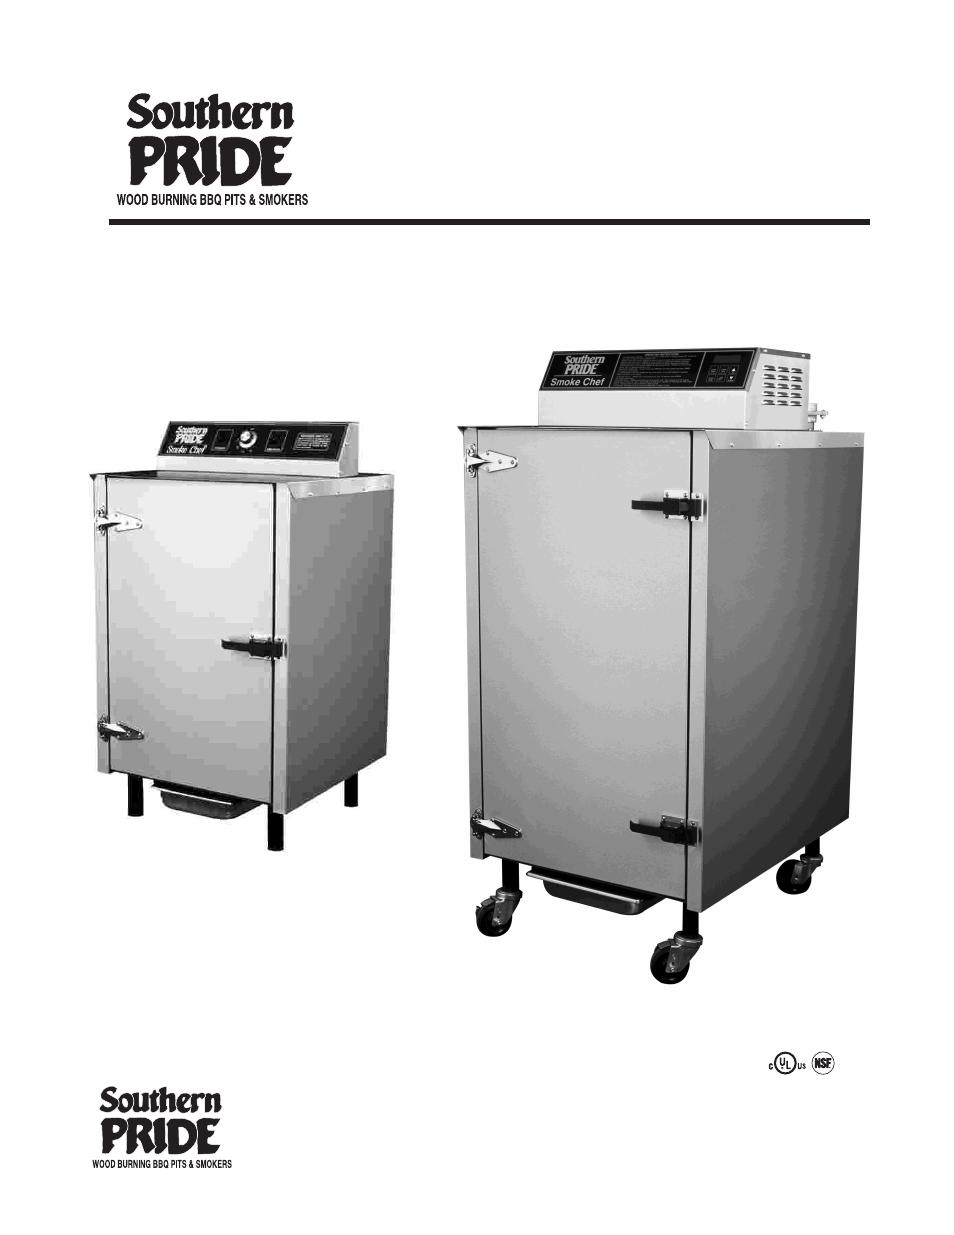 southern pride sc 200 user manual 16 pages. Black Bedroom Furniture Sets. Home Design Ideas